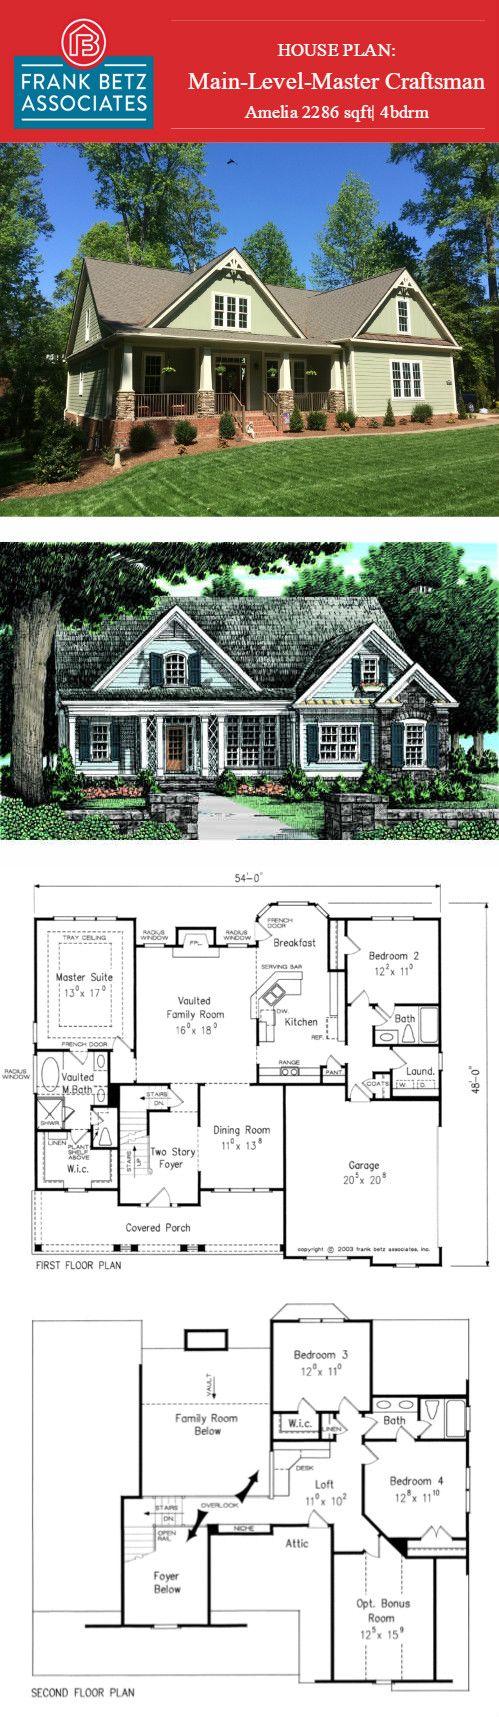 Amelia 2286sqft 4bdrm Main Level Master Craftsman Designed By Frank Betz Craftsman House Plans House Plans Farmhouse House Plans One Story